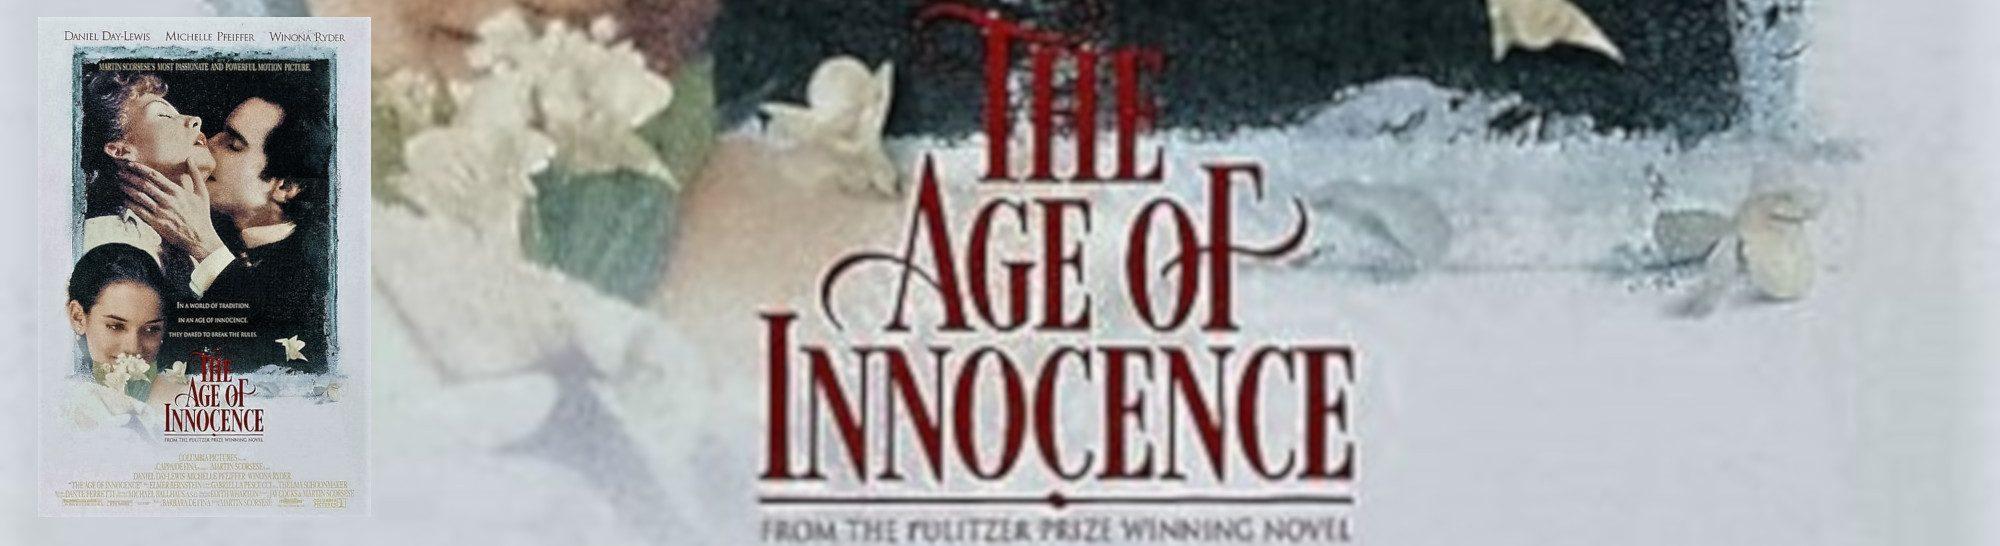 TheAgeOfInnocence Banner